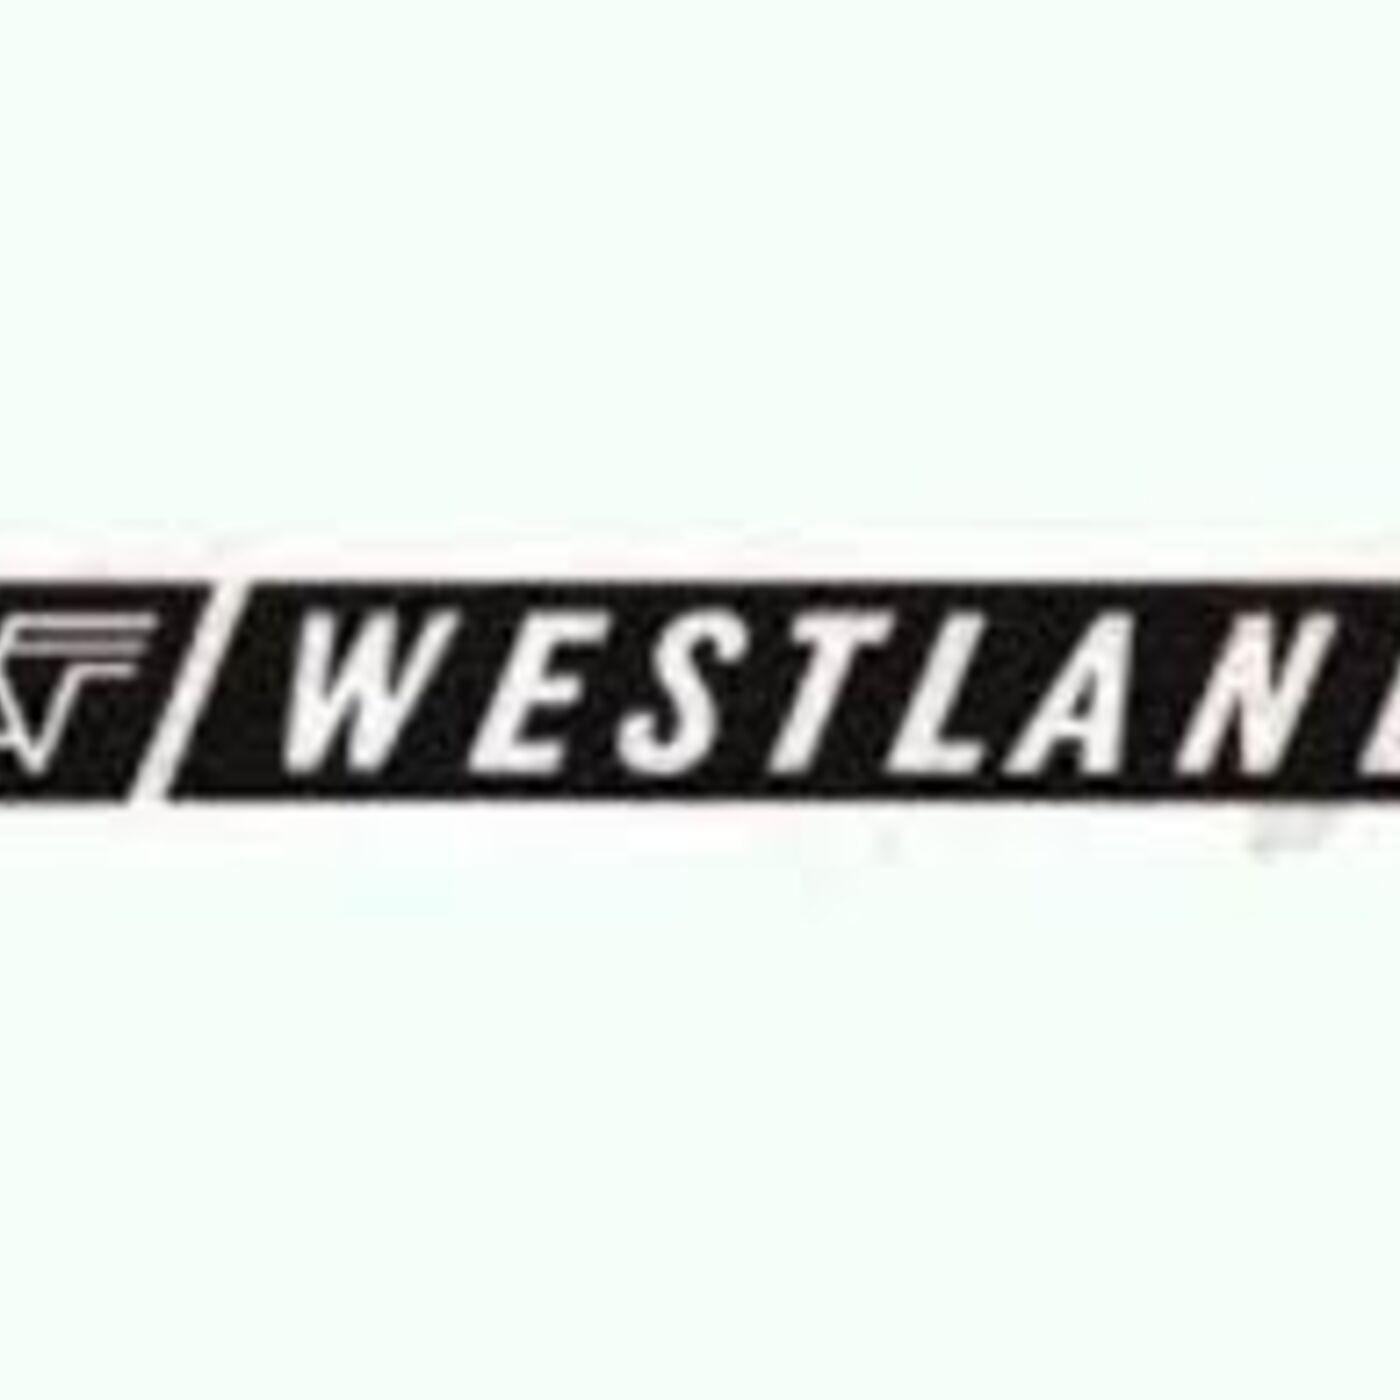 Westland Aircraft